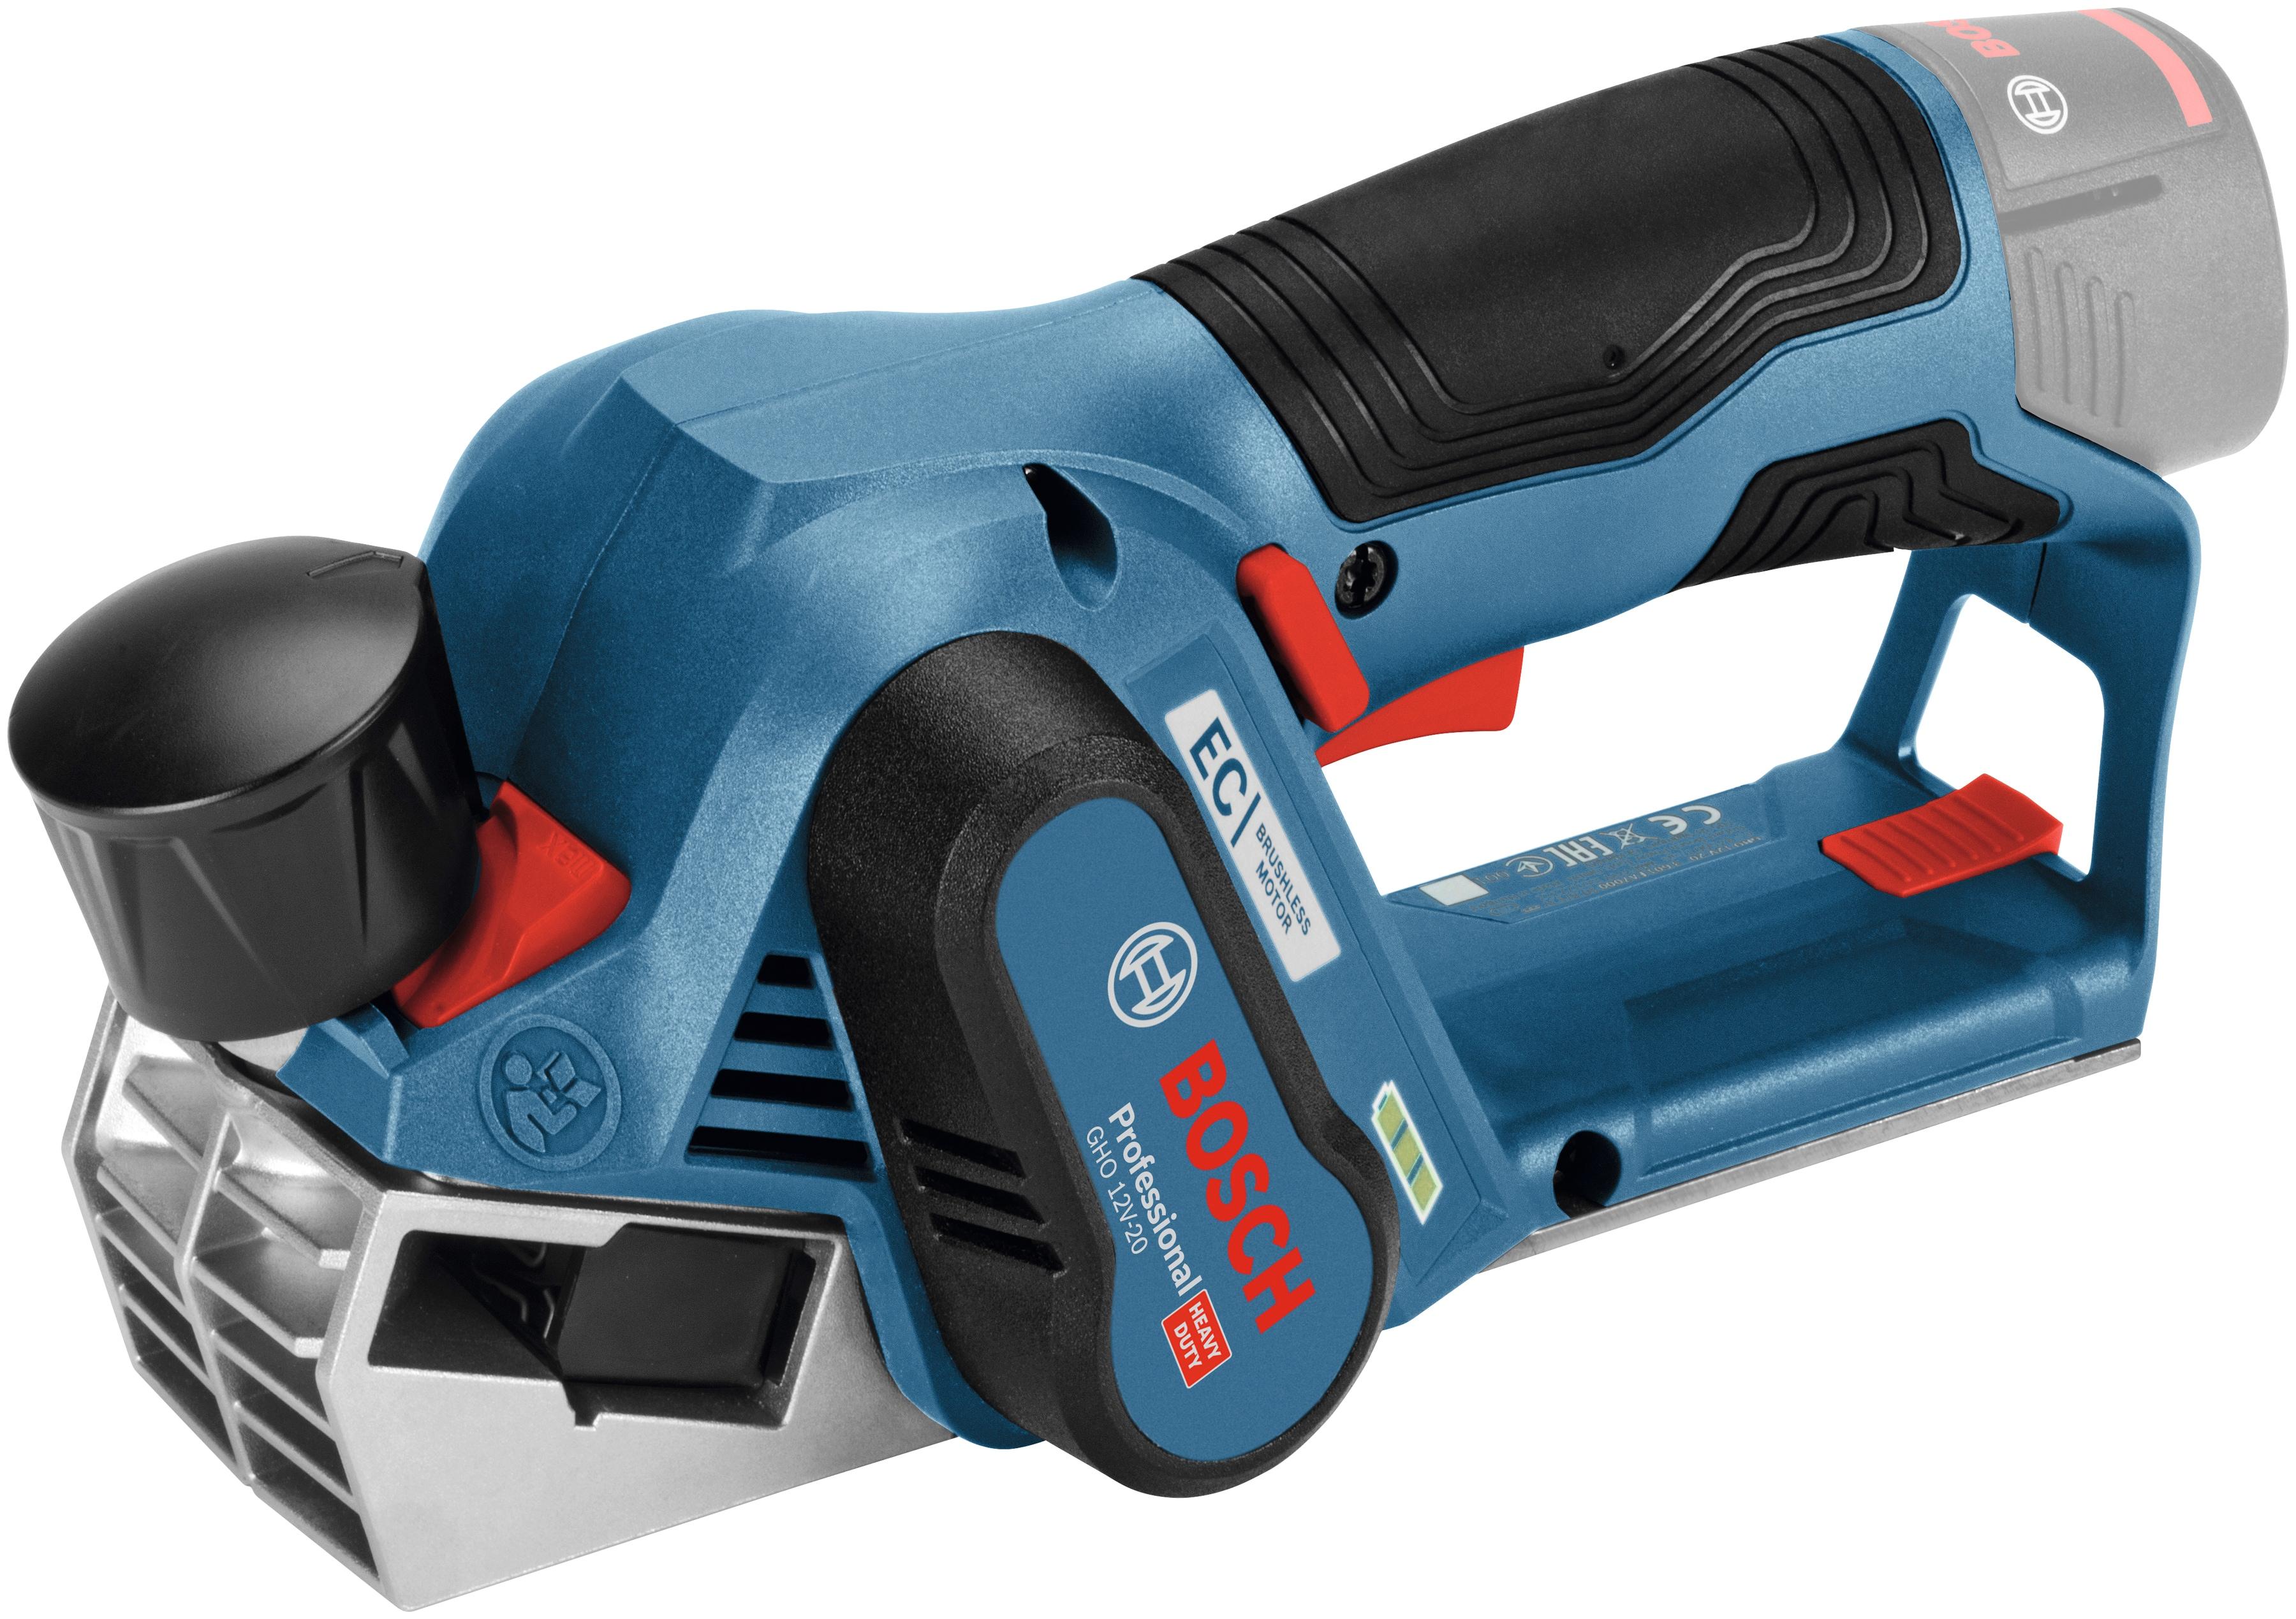 BOSCH PROFESSIONAL Hobel »GHO 12V-20 Hobel« | Baumarkt > Werkzeug > Hobel und Tacker | BOSCH PROFESSIONAL